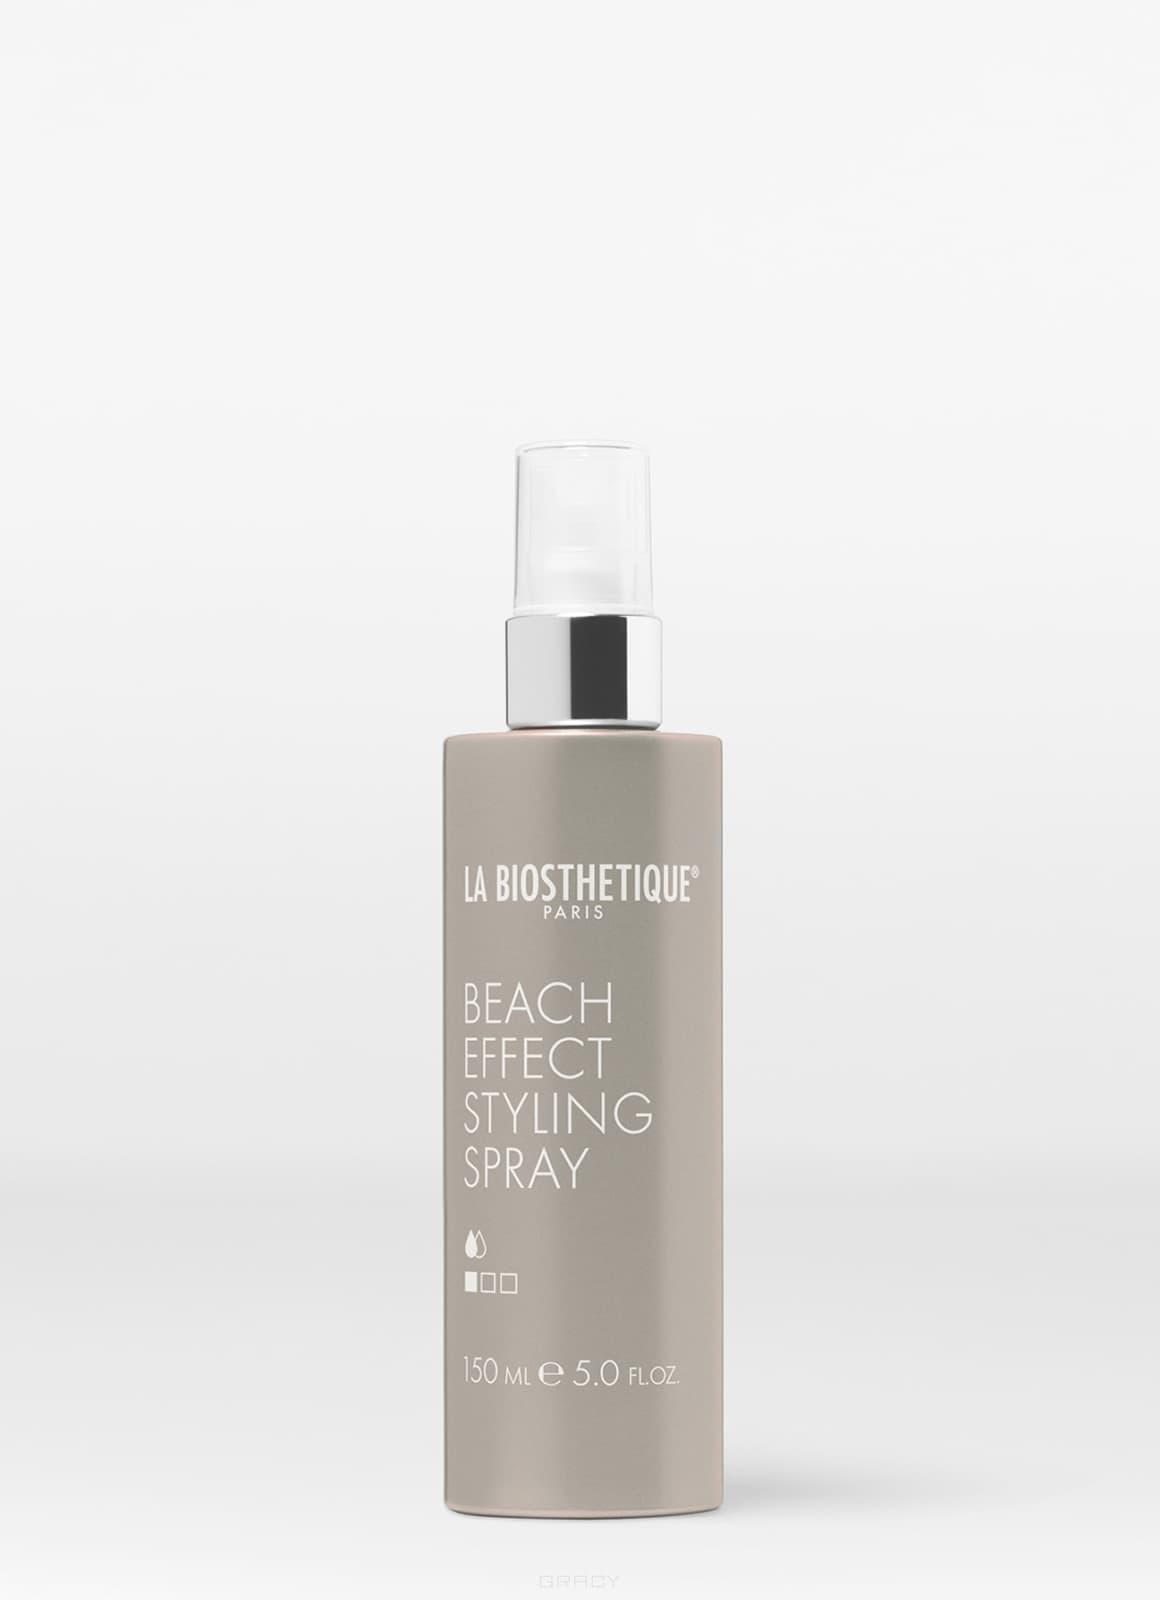 La Biosthetique, Стайлинг-спрей для создания пляжного стиля Style Beach Effect Styling Spray, 150 мл nioxin 3d styling therm activ protector термозащитный спрей 150 мл